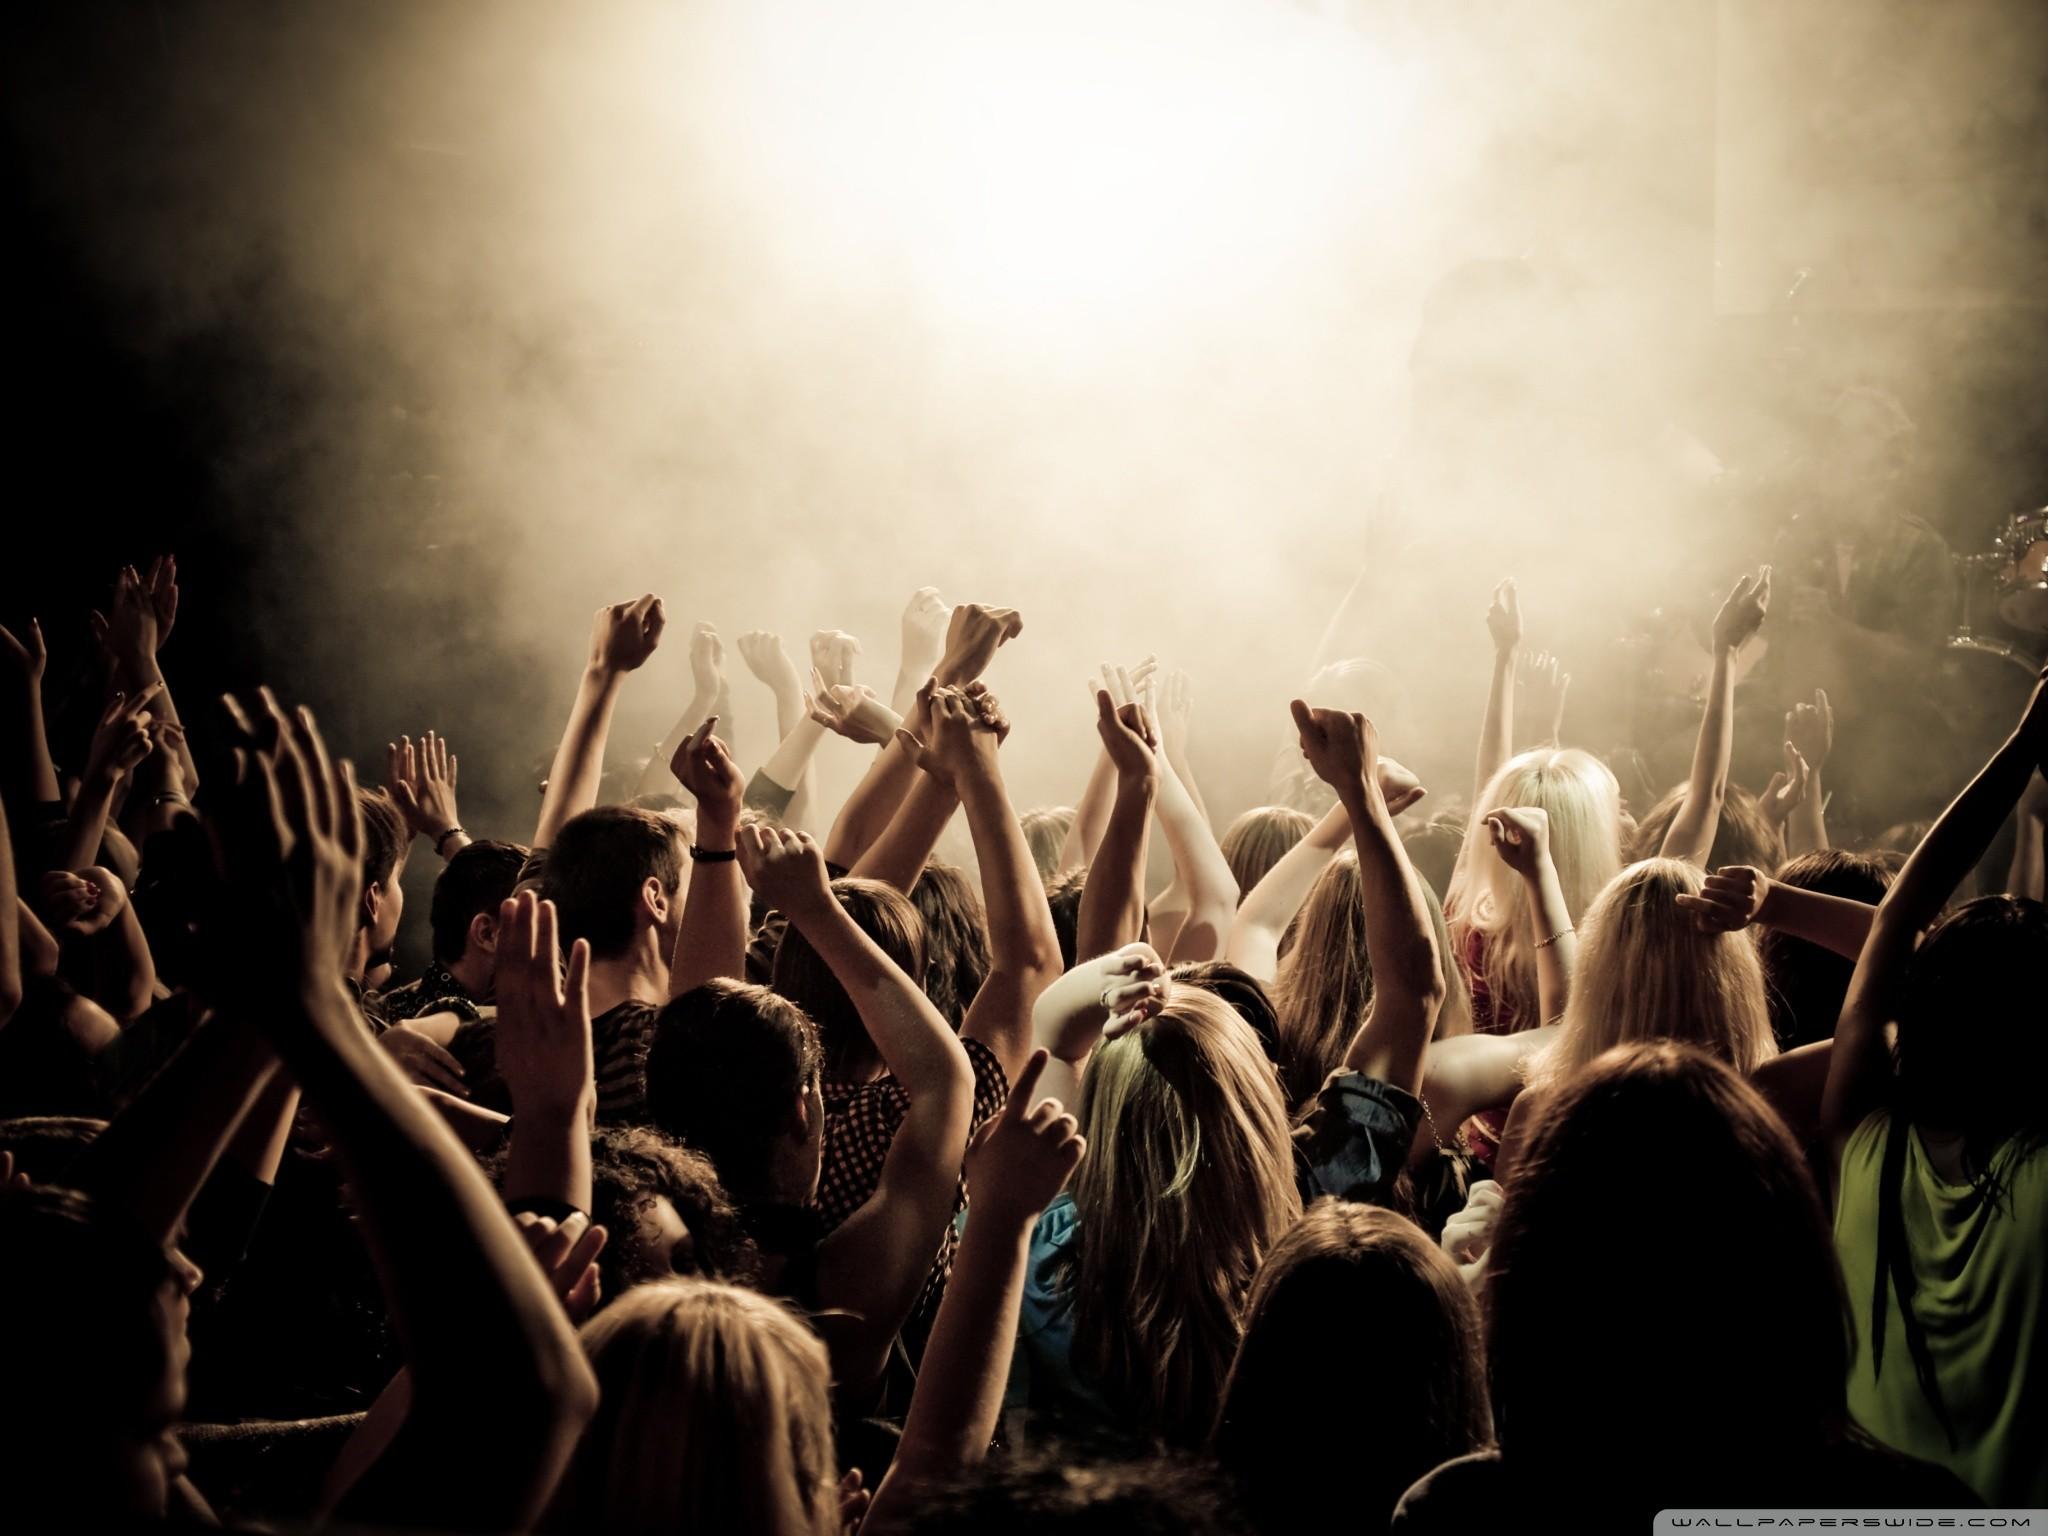 Concert Crowd Wallpaper 65 Images